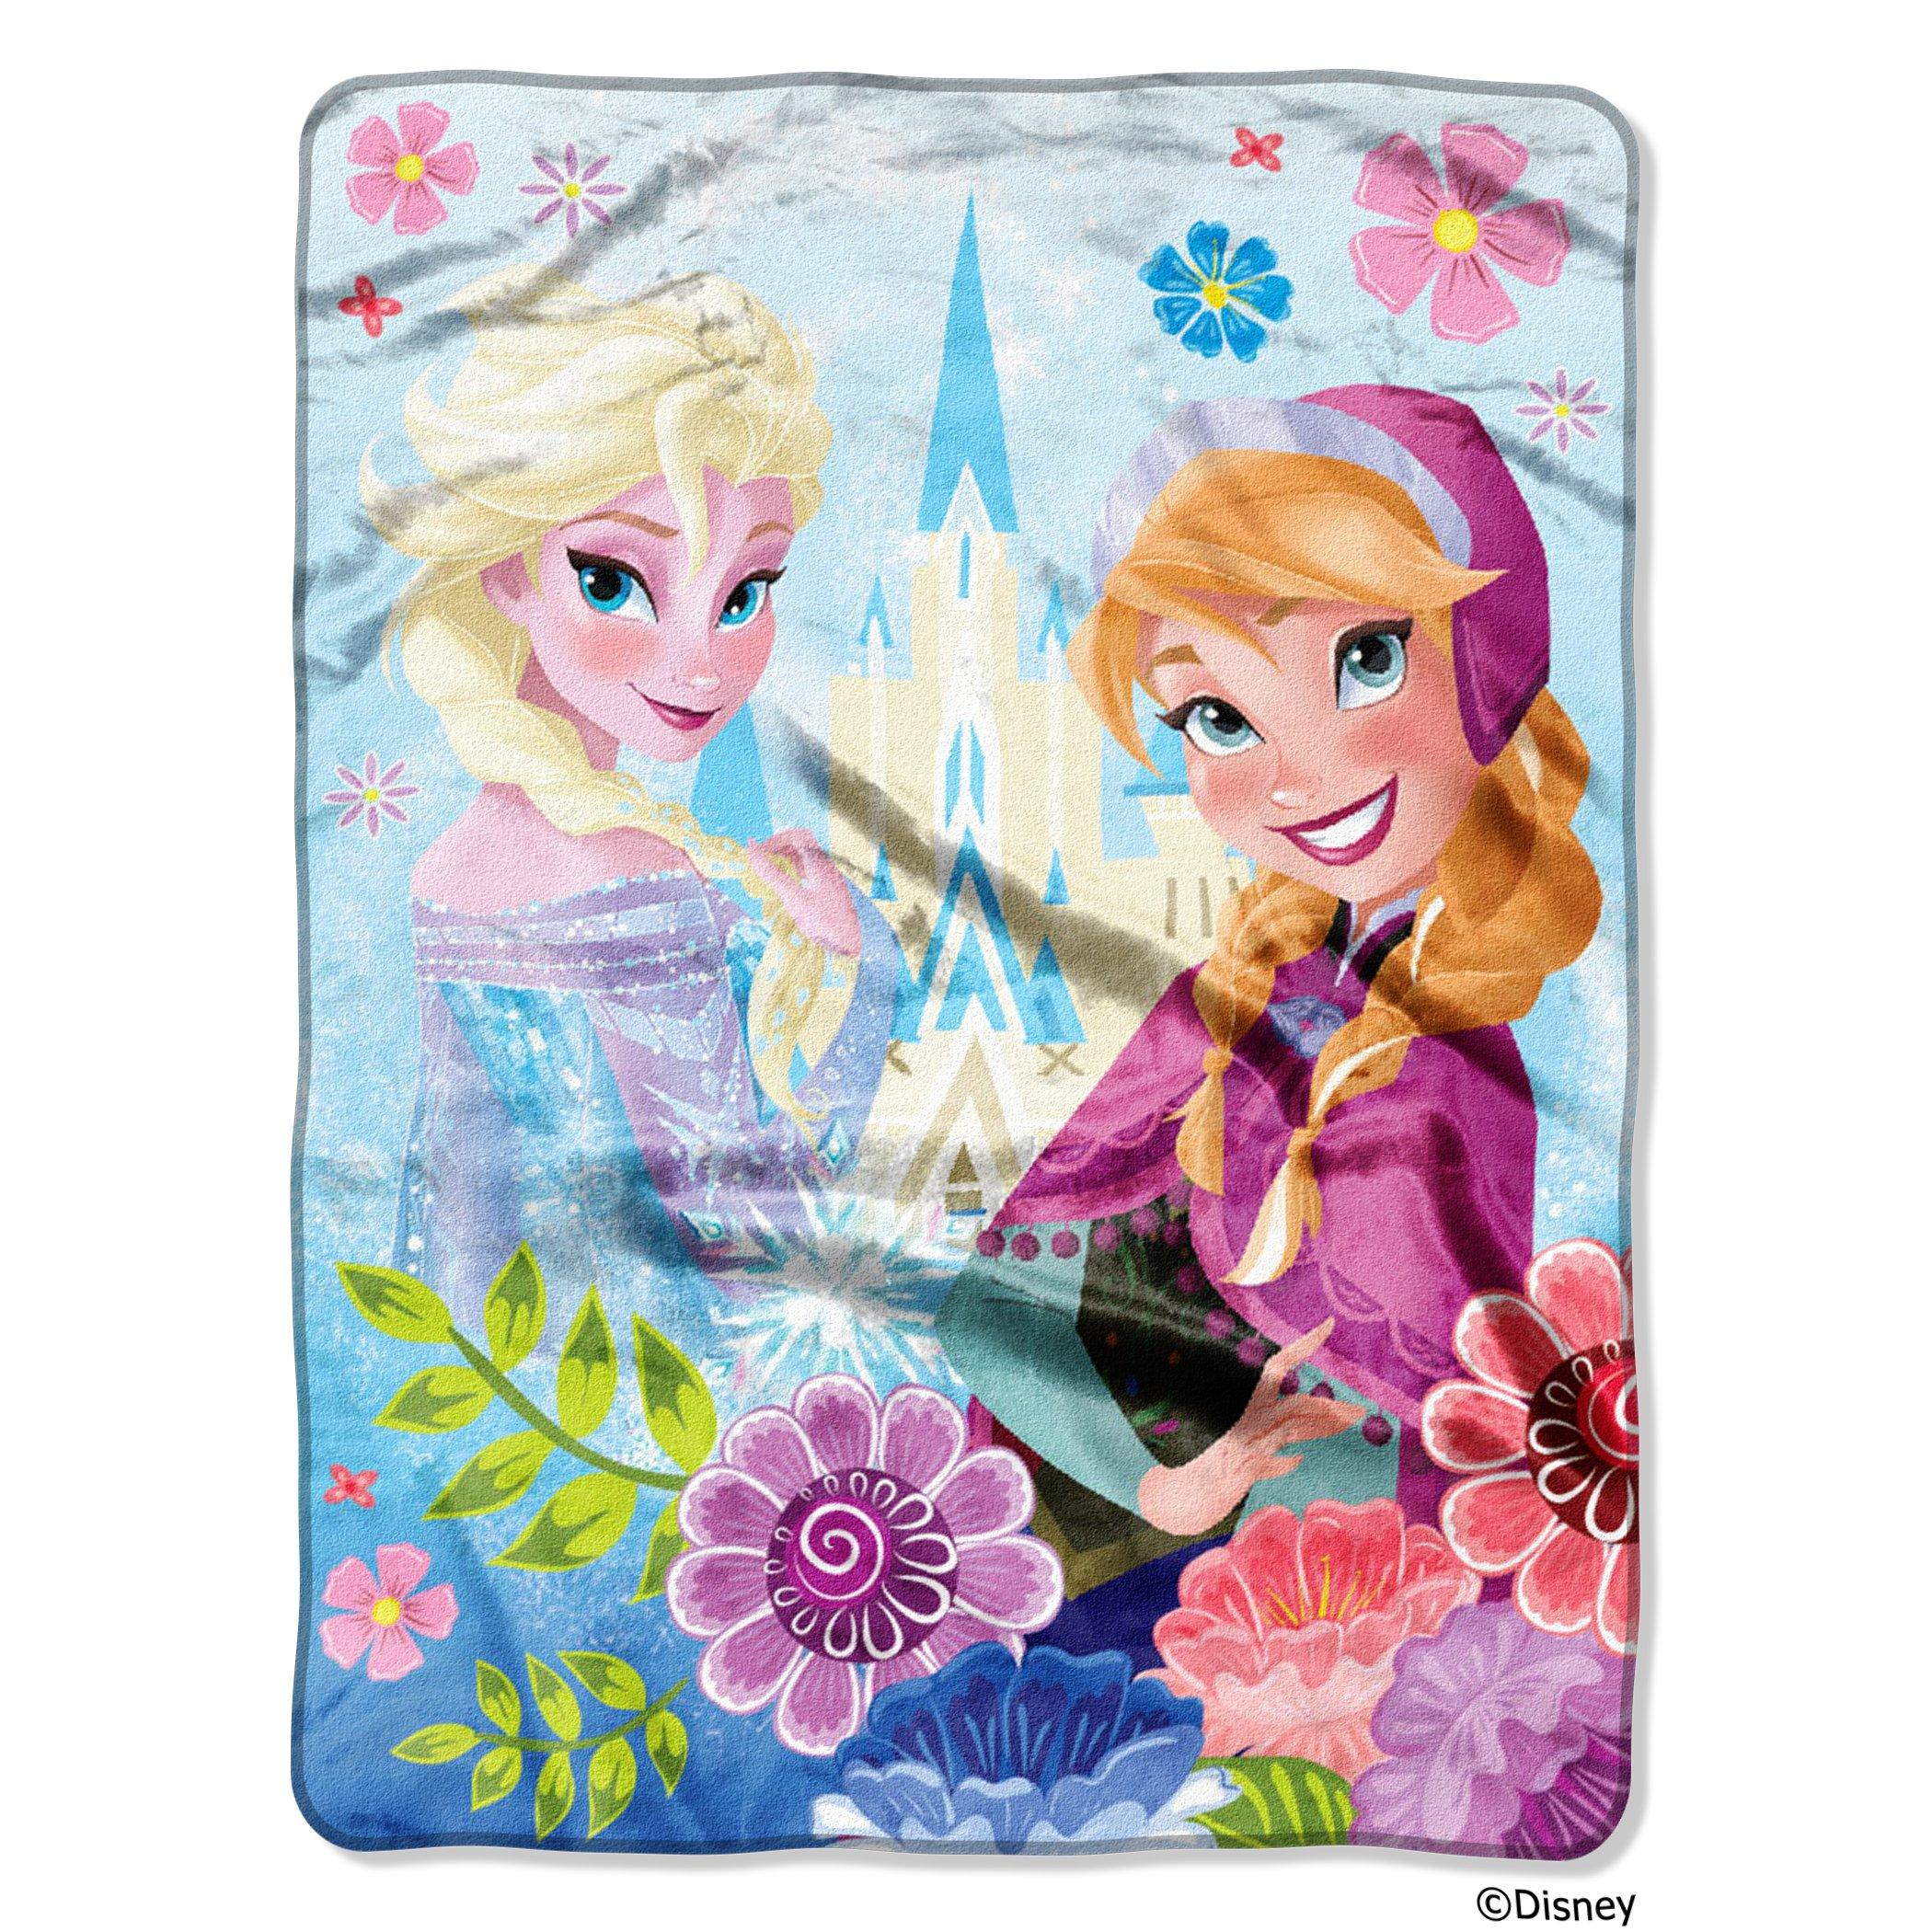 Disney's Frozen, ''Floral Fjord'' Micro Raschel Throw Blanket, 46'' x 60'', Multi Color by Disney